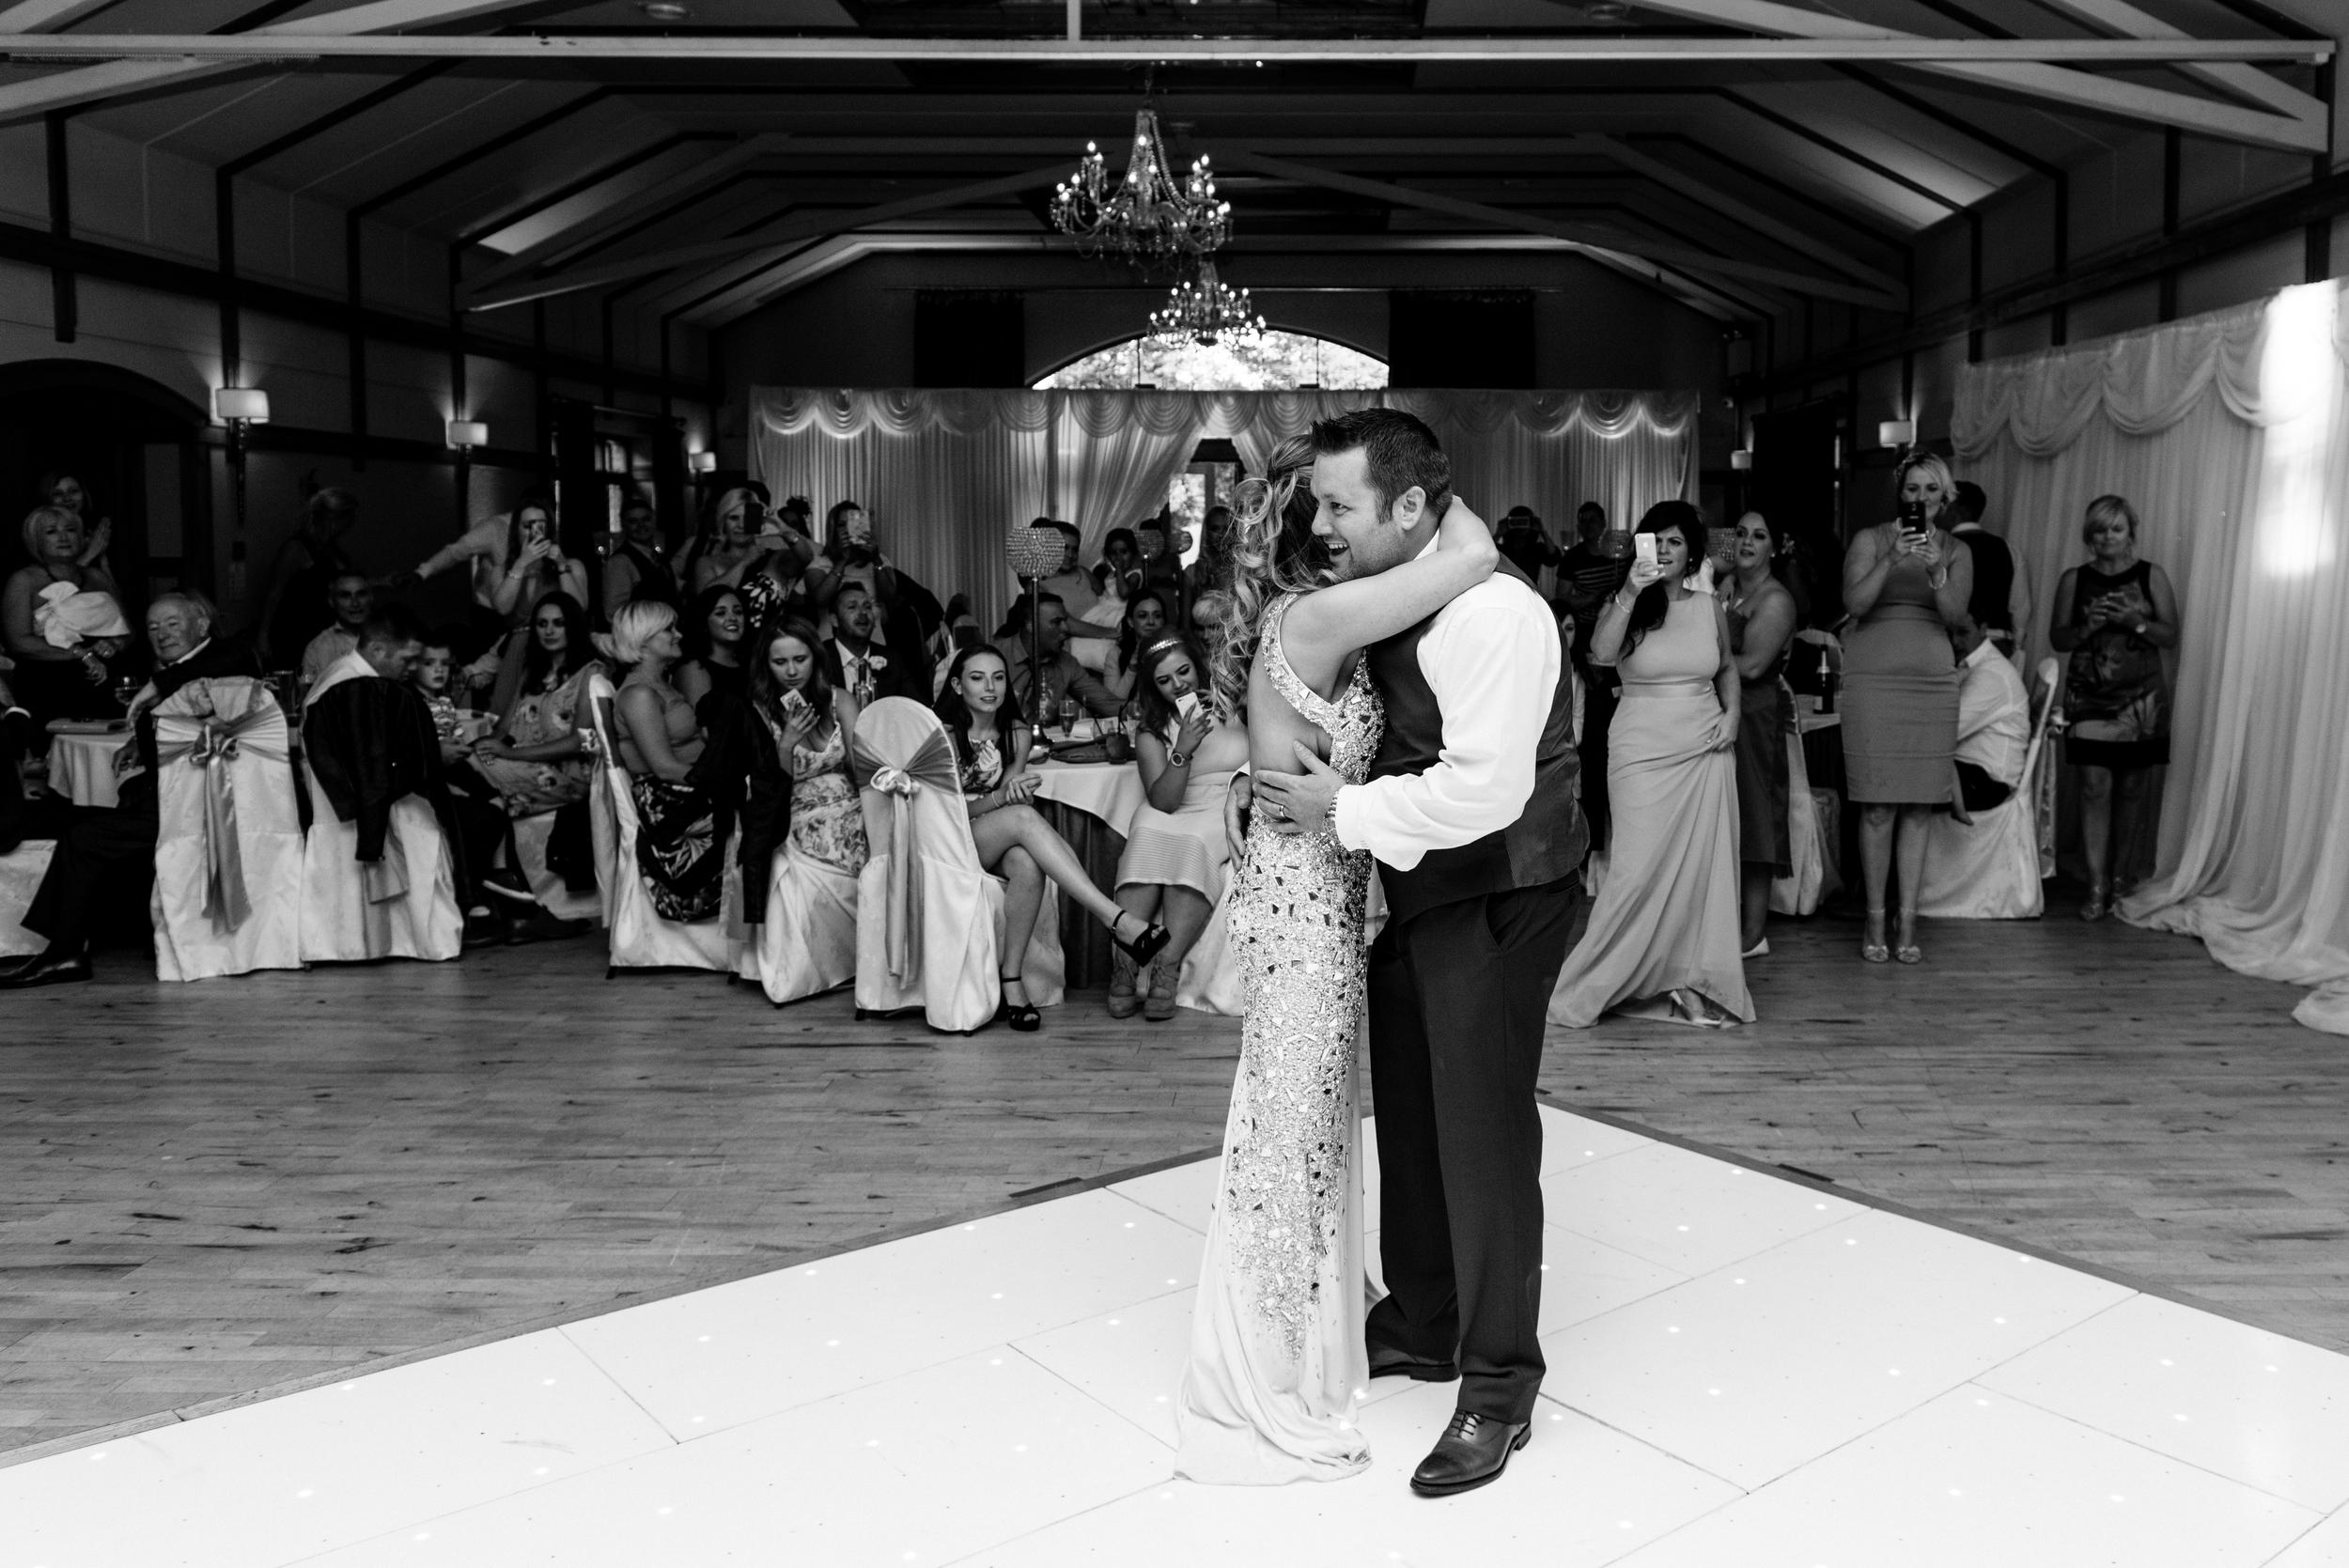 Lusty Beg Island Northern Ireland Wedding Photographers Pure Photo N.I groom dancing